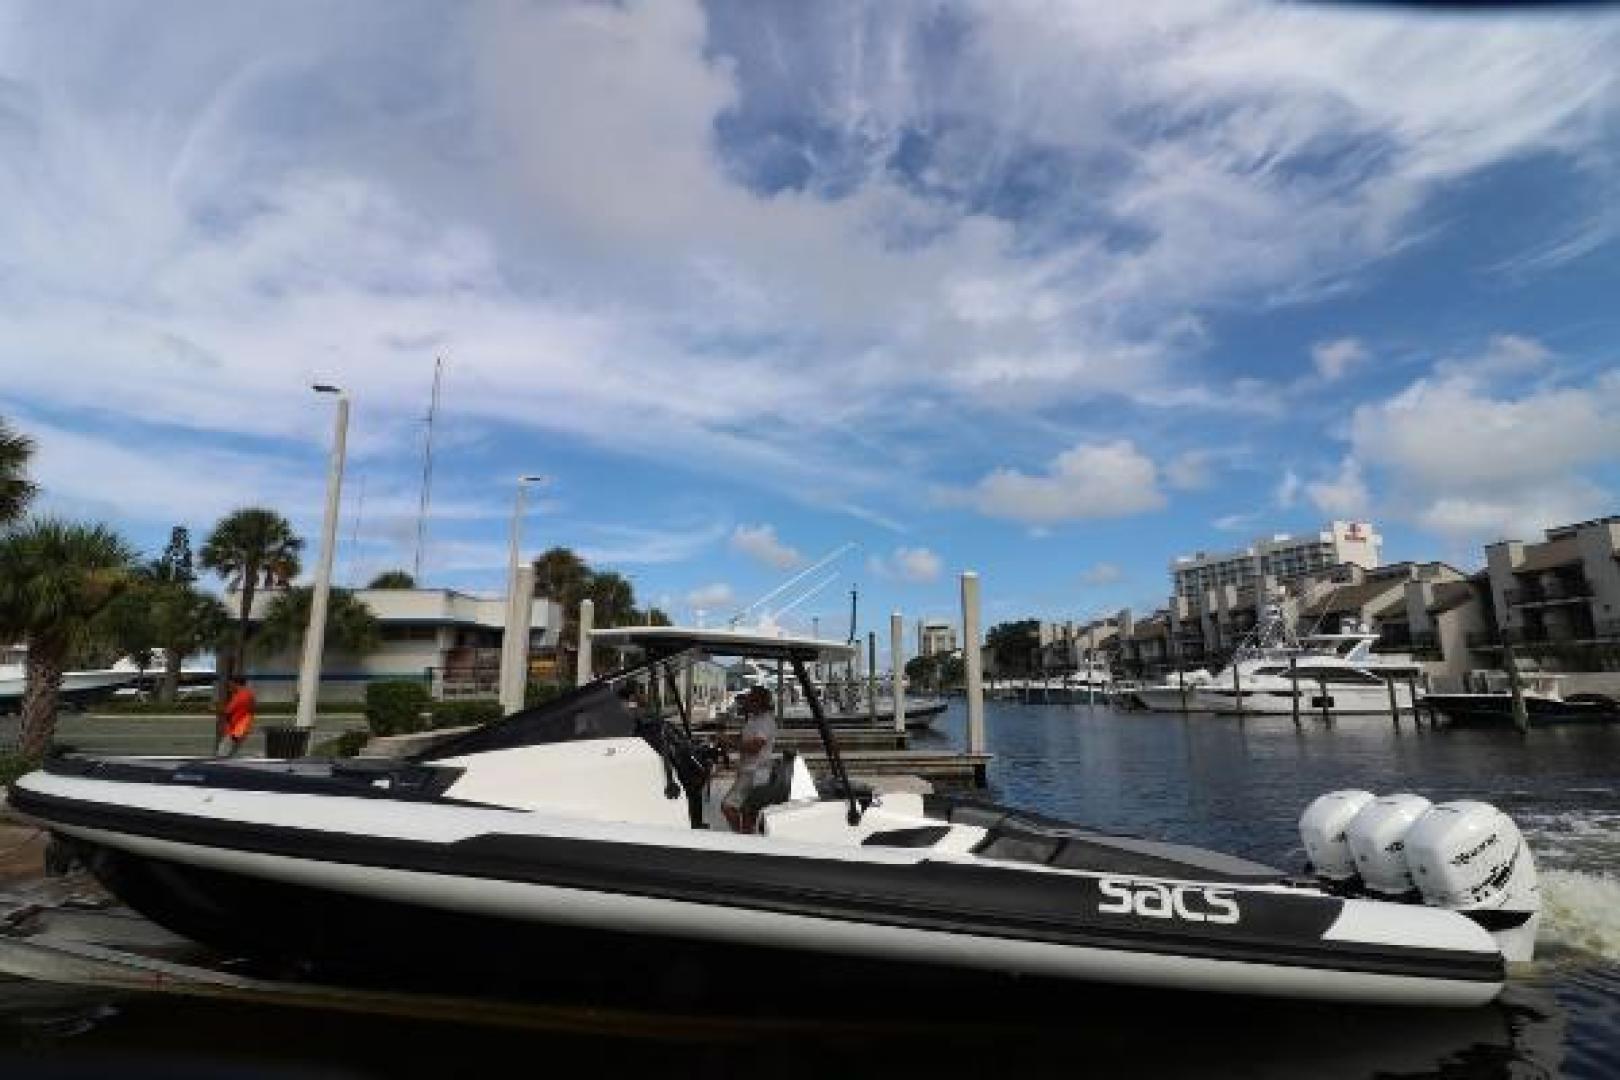 Sacs-Strider 40 ESSE R 2016-Sacs Strider 40 ESSE R Fort Lauderdale-Florida-United States-1533413   Thumbnail